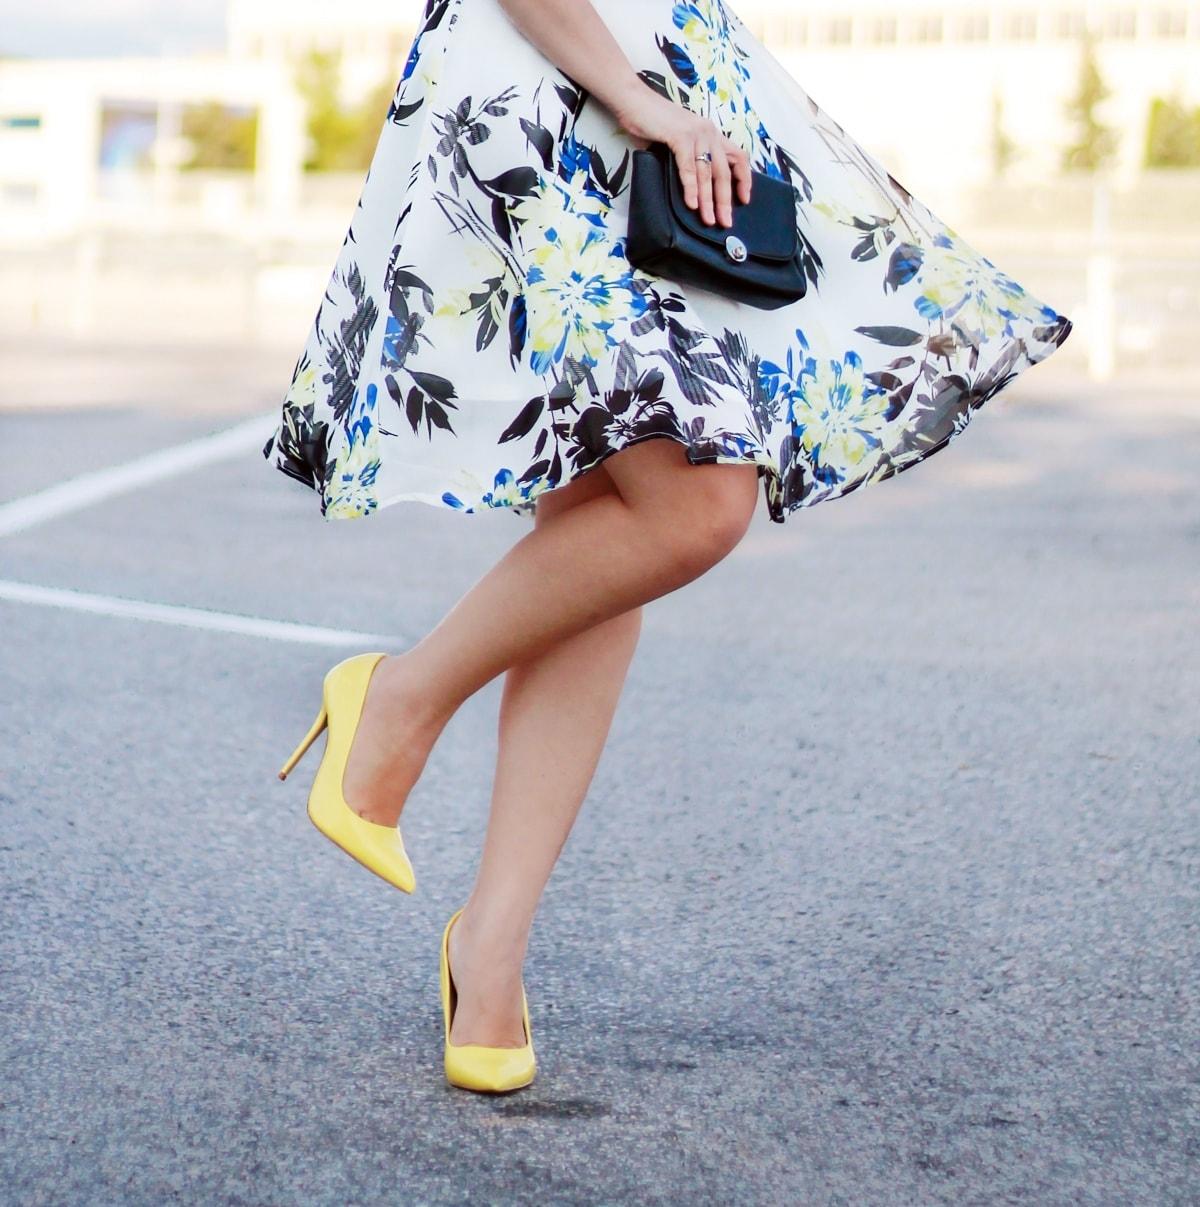 rochie imprimeu floral de vara, vaporoasa, pantofi galben pastel, stiletto, poema